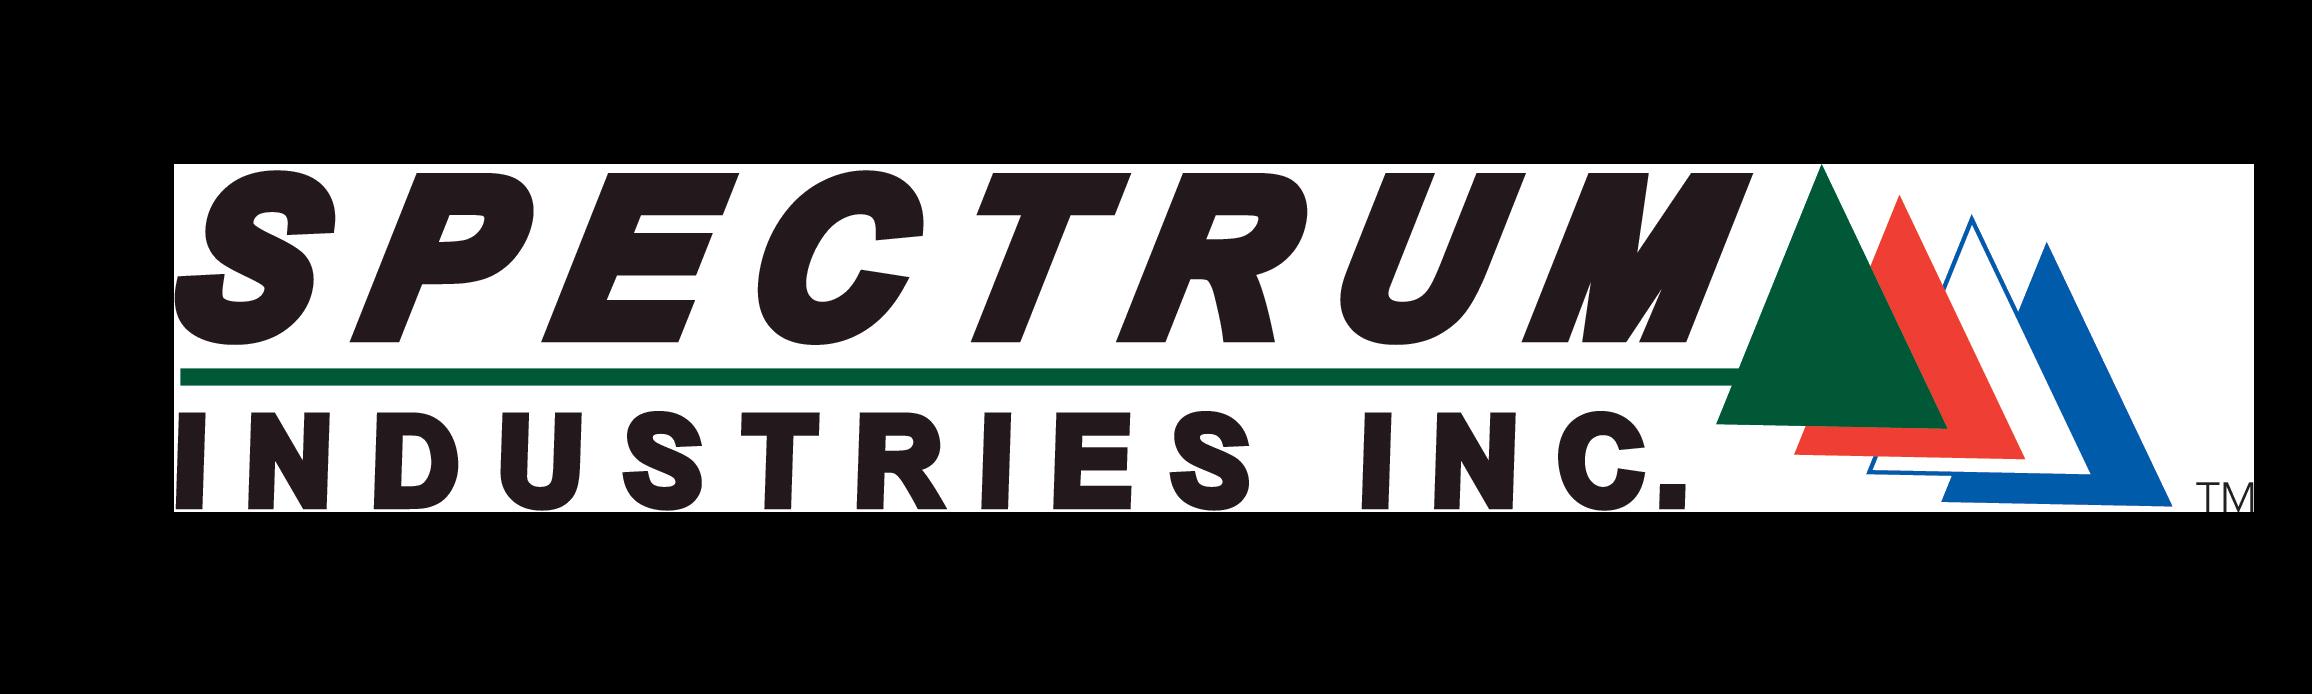 NAECAD Partner - Spectrum Industries Inc